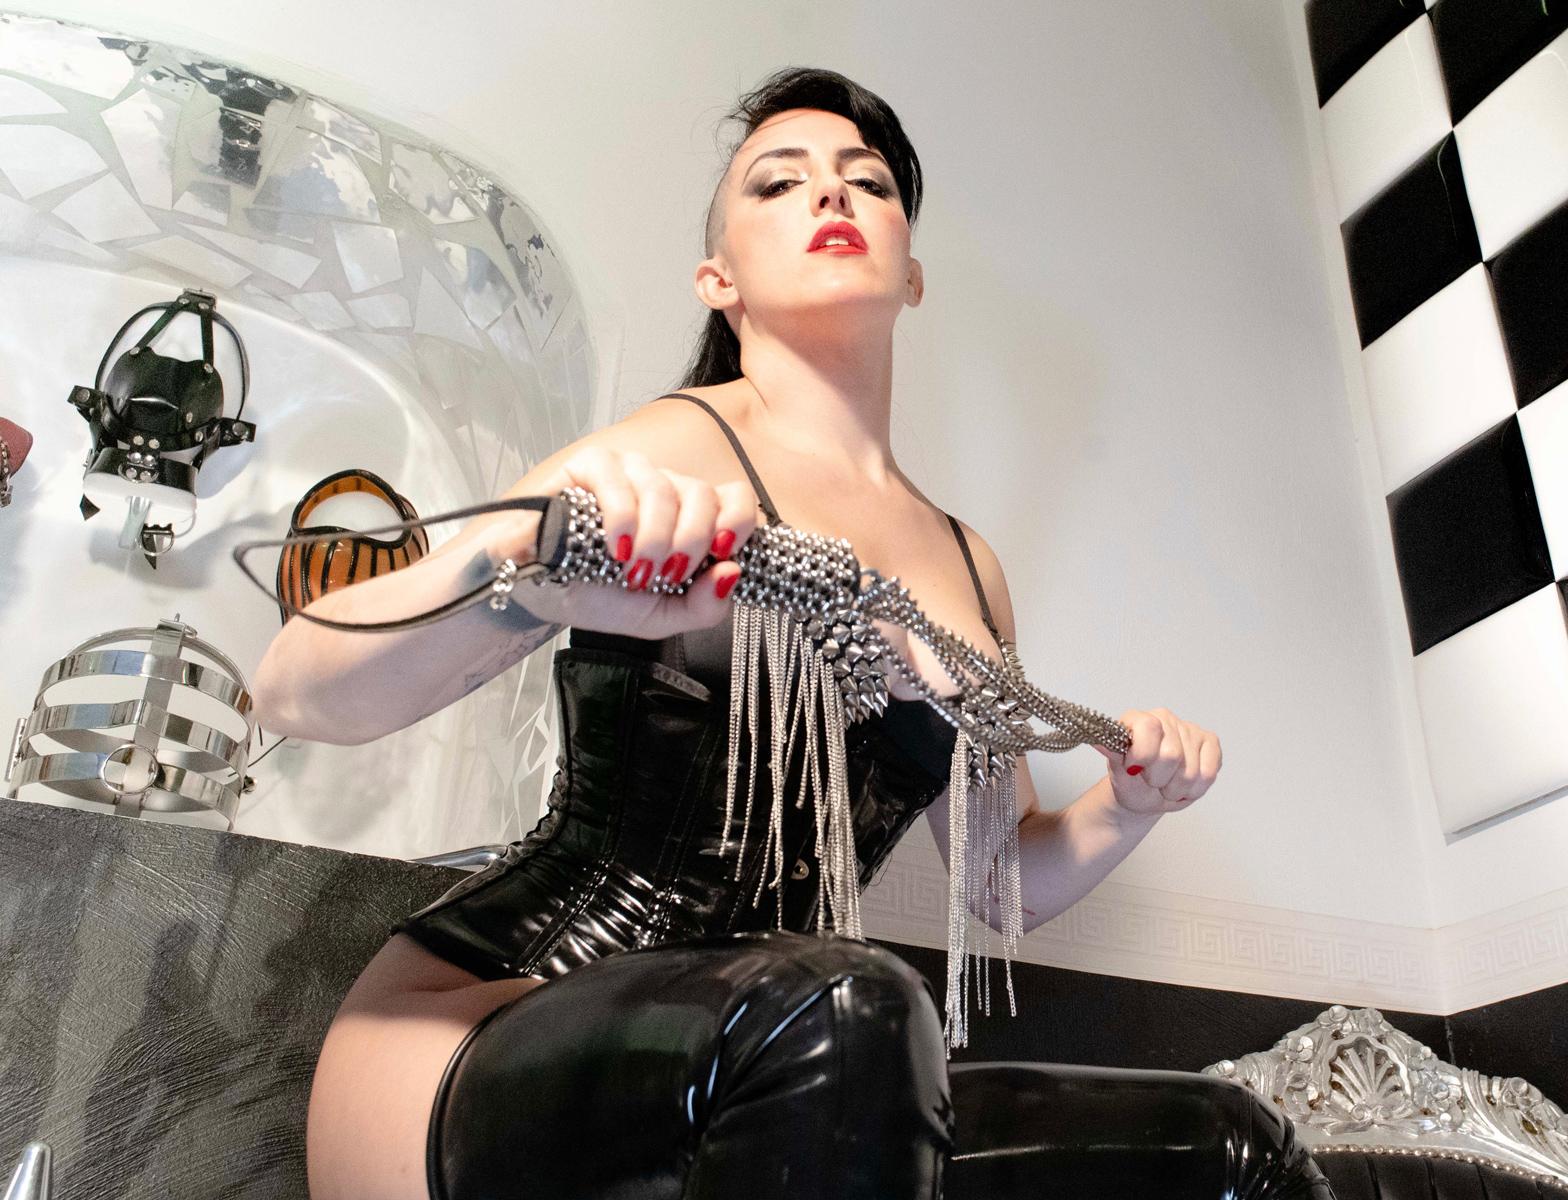 Mistress Amandara